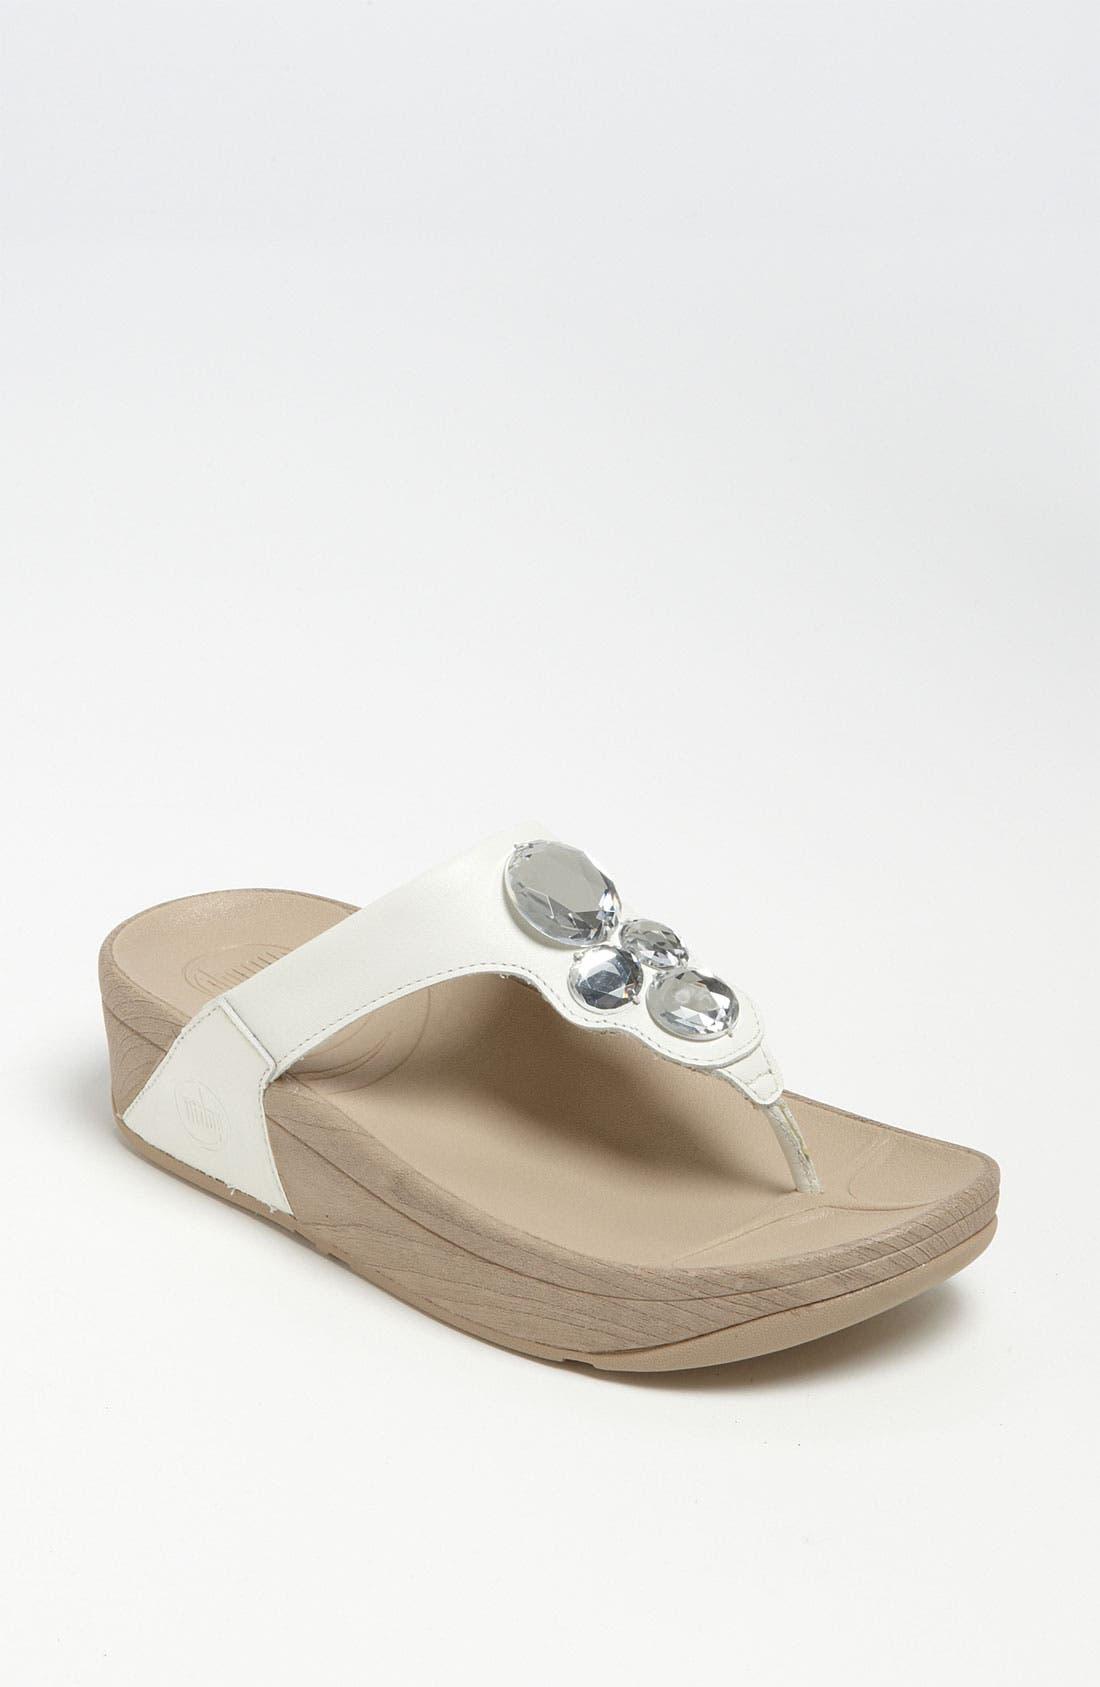 Main Image - FitFlop 'Lunetta' Sandal